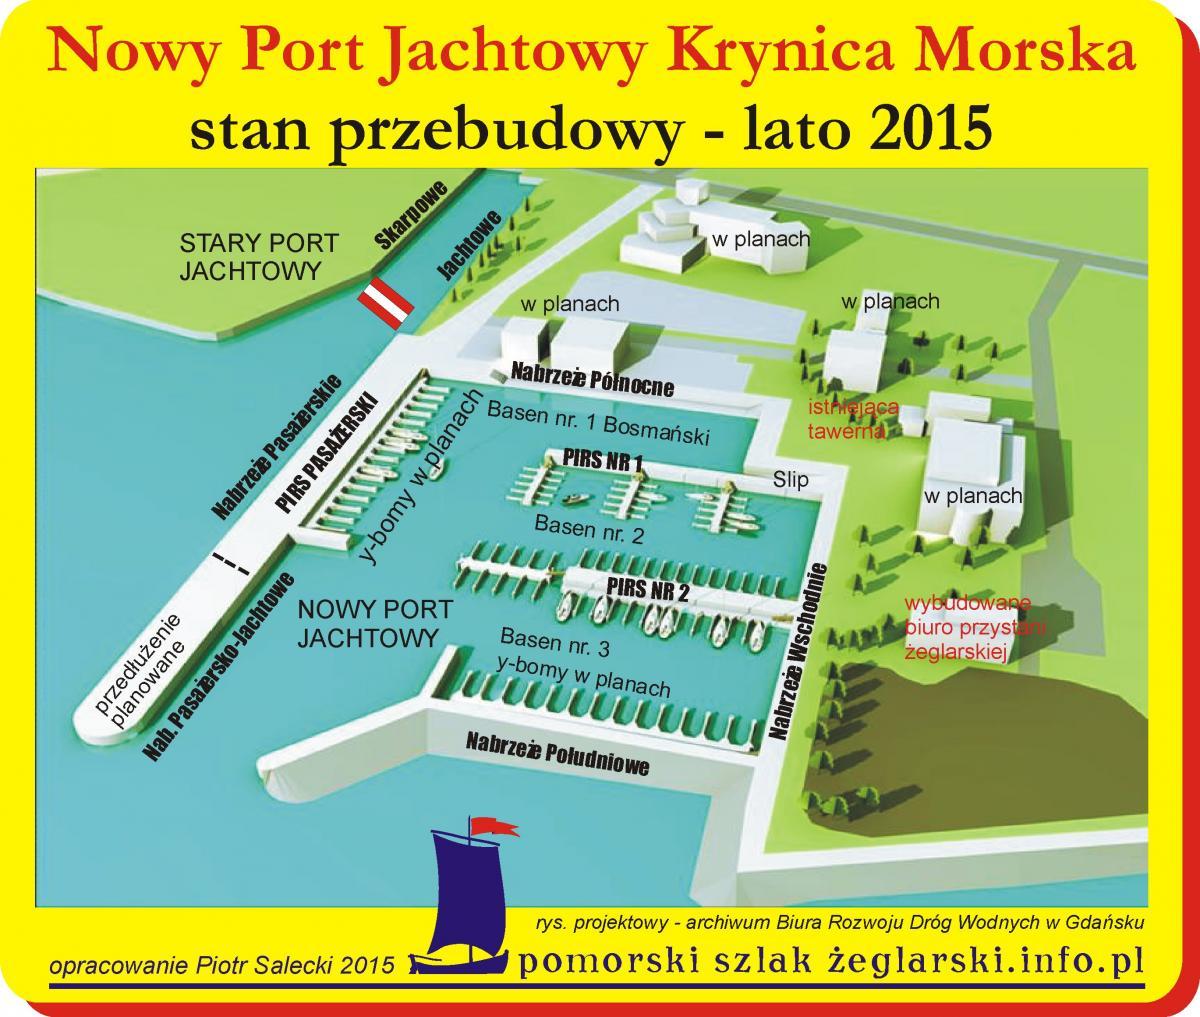 Port Jachtowy Krynica Morska